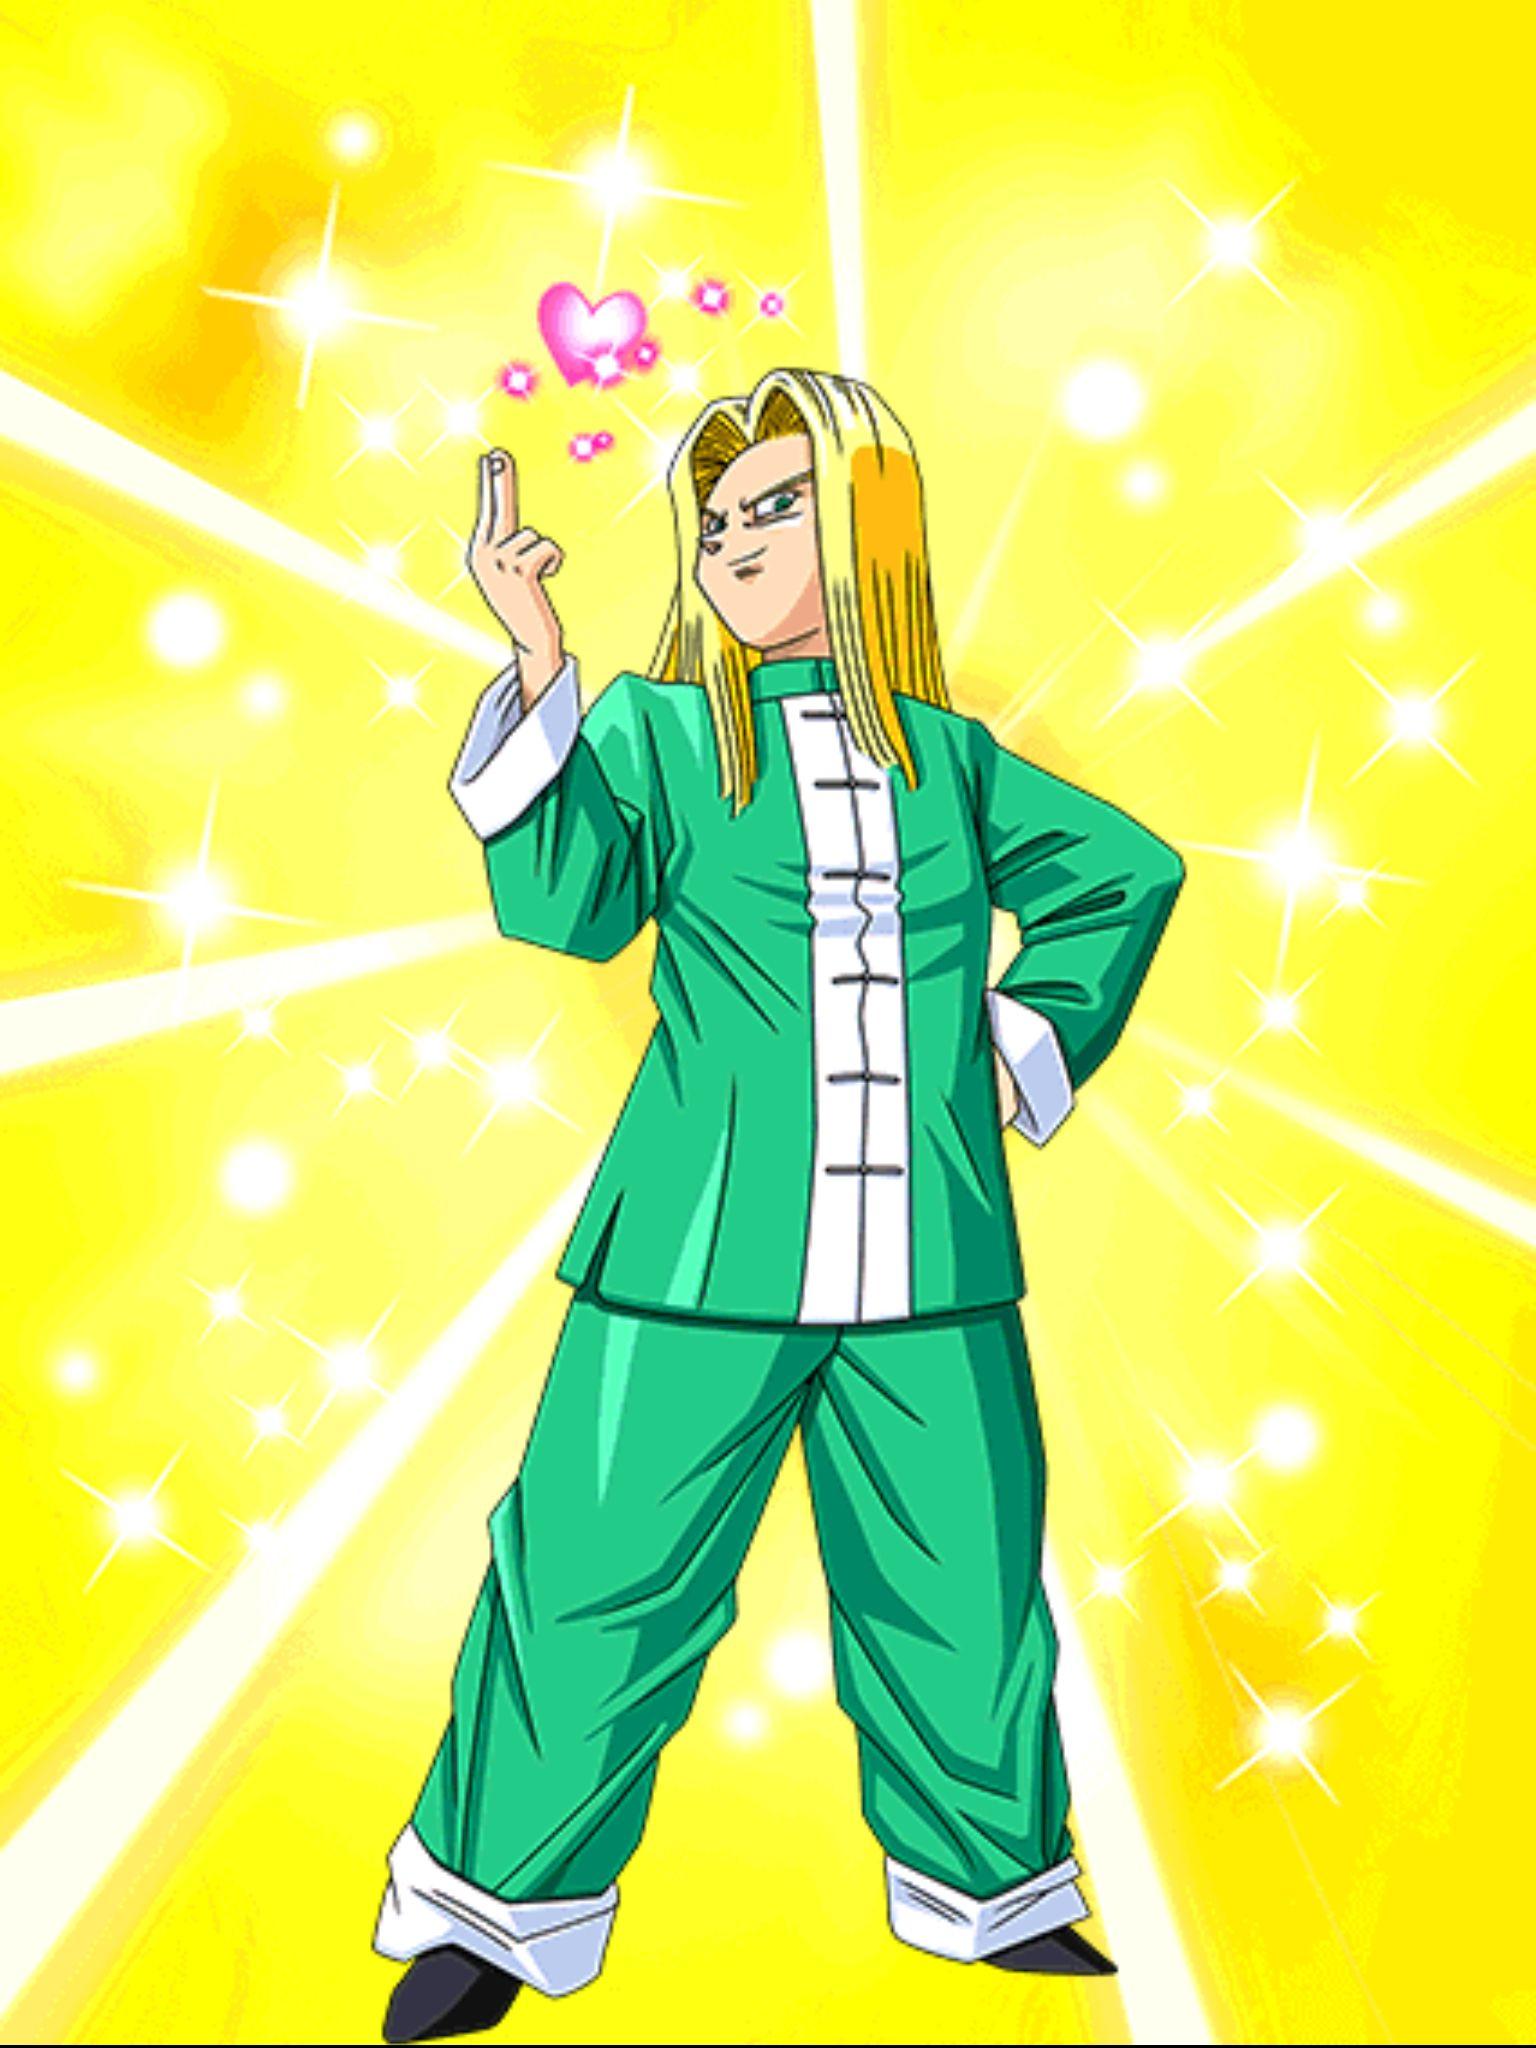 dragonball dokkan battle ジュエール ドラゴンボール ドラゴンボールz ドッカン バトル